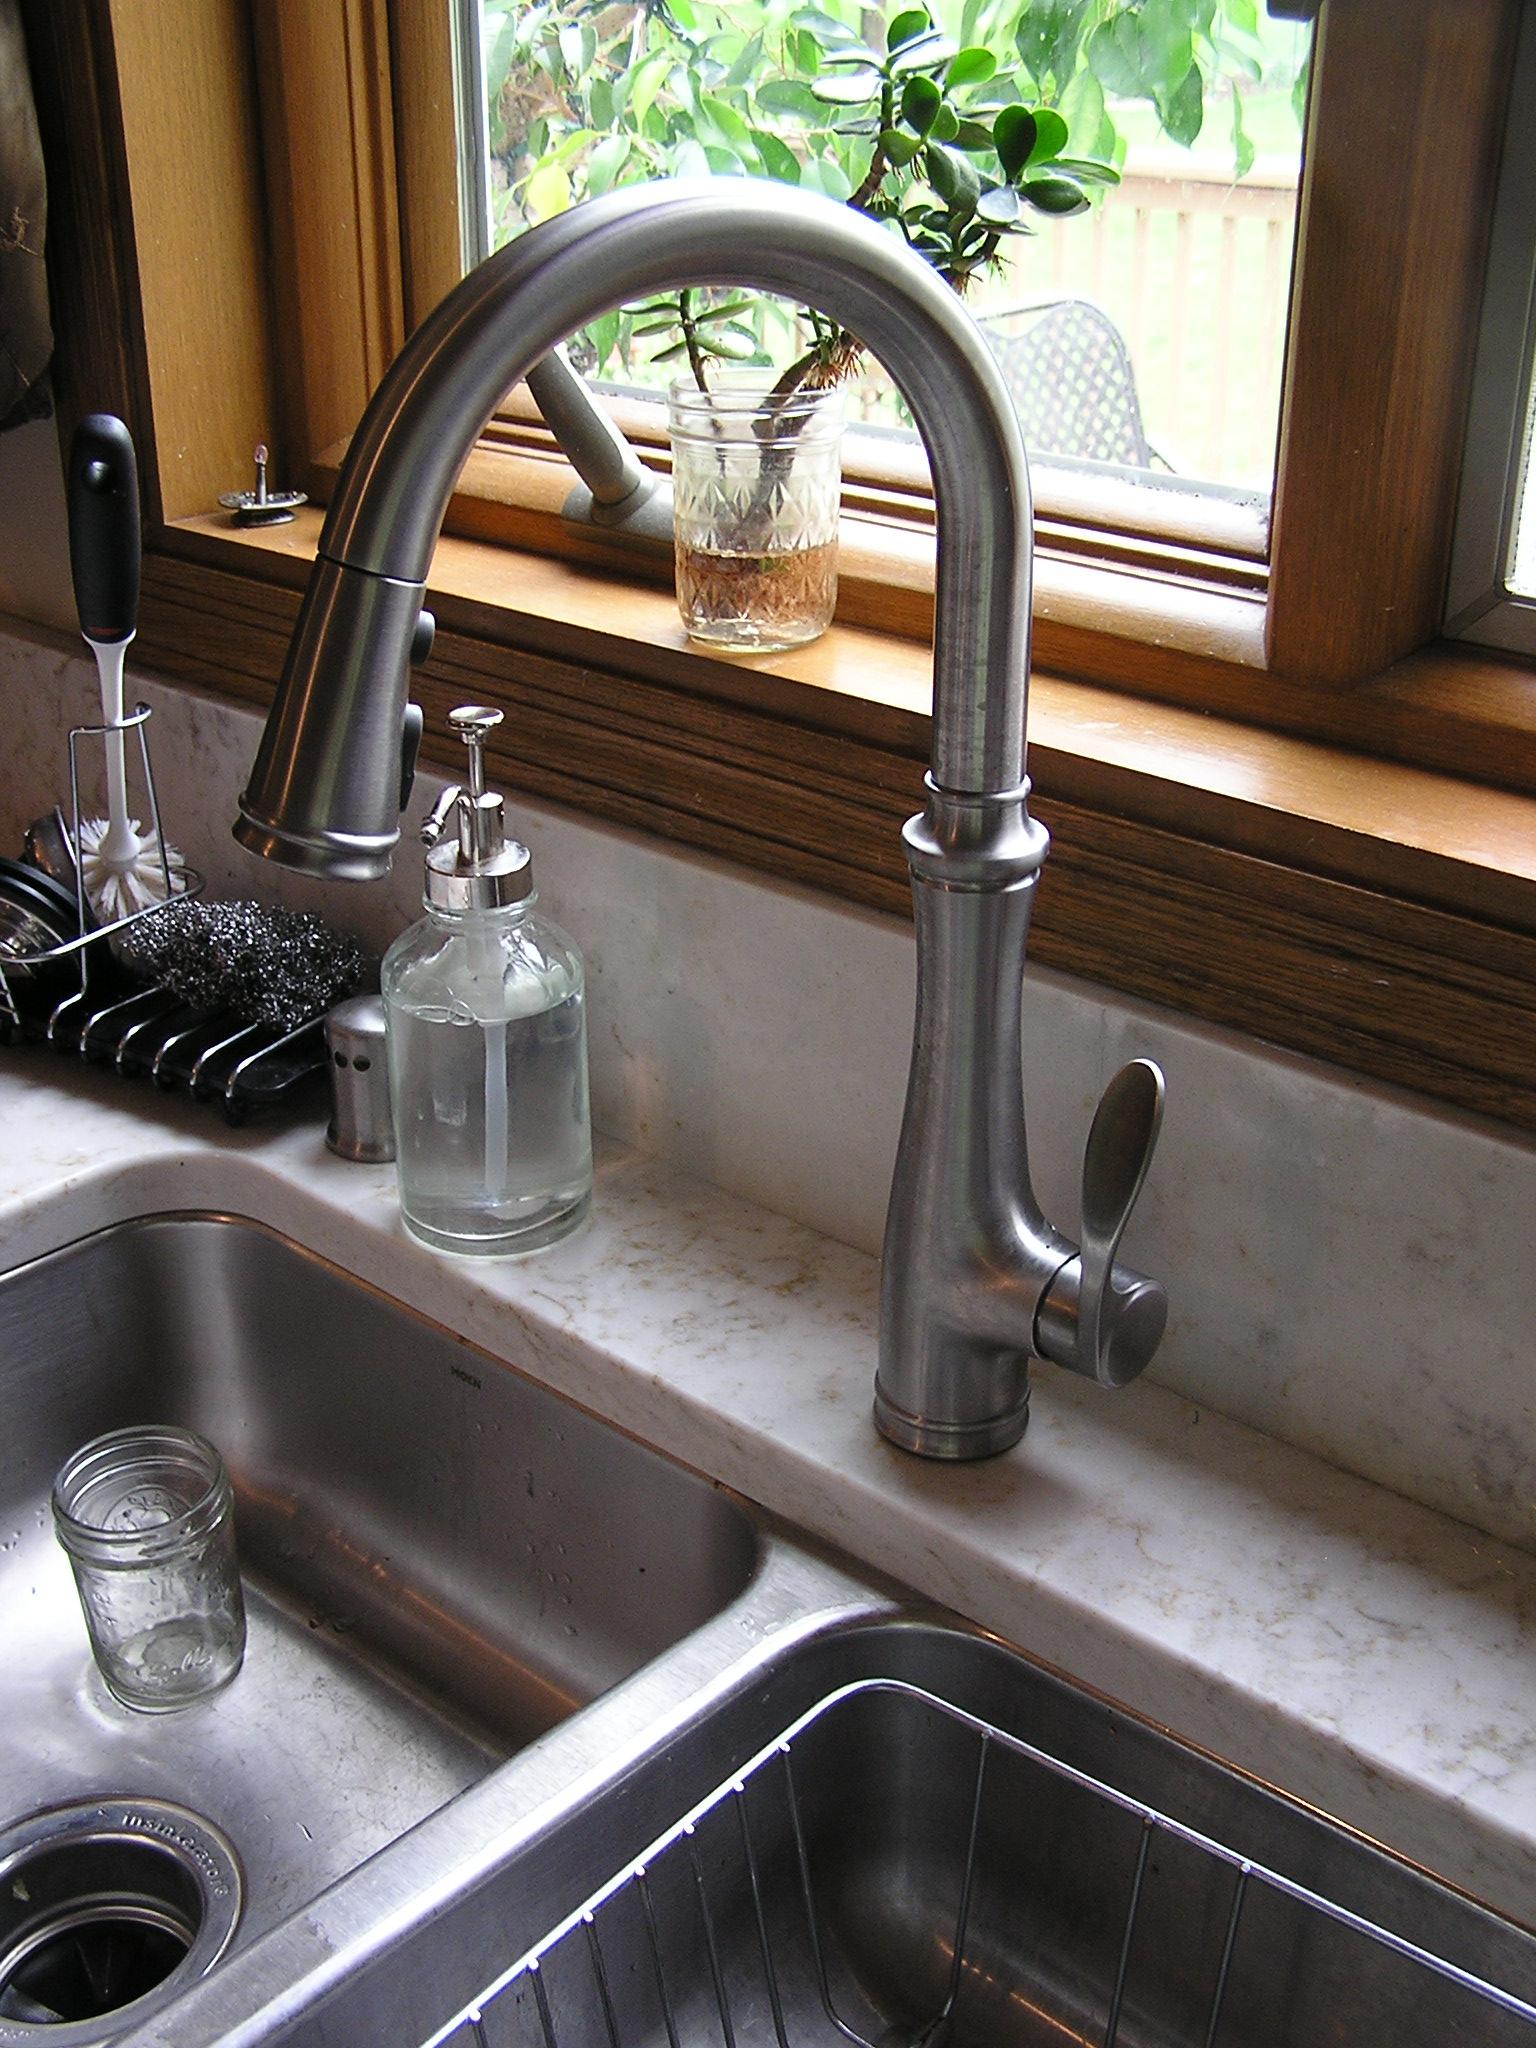 Kohler kitchen faucet